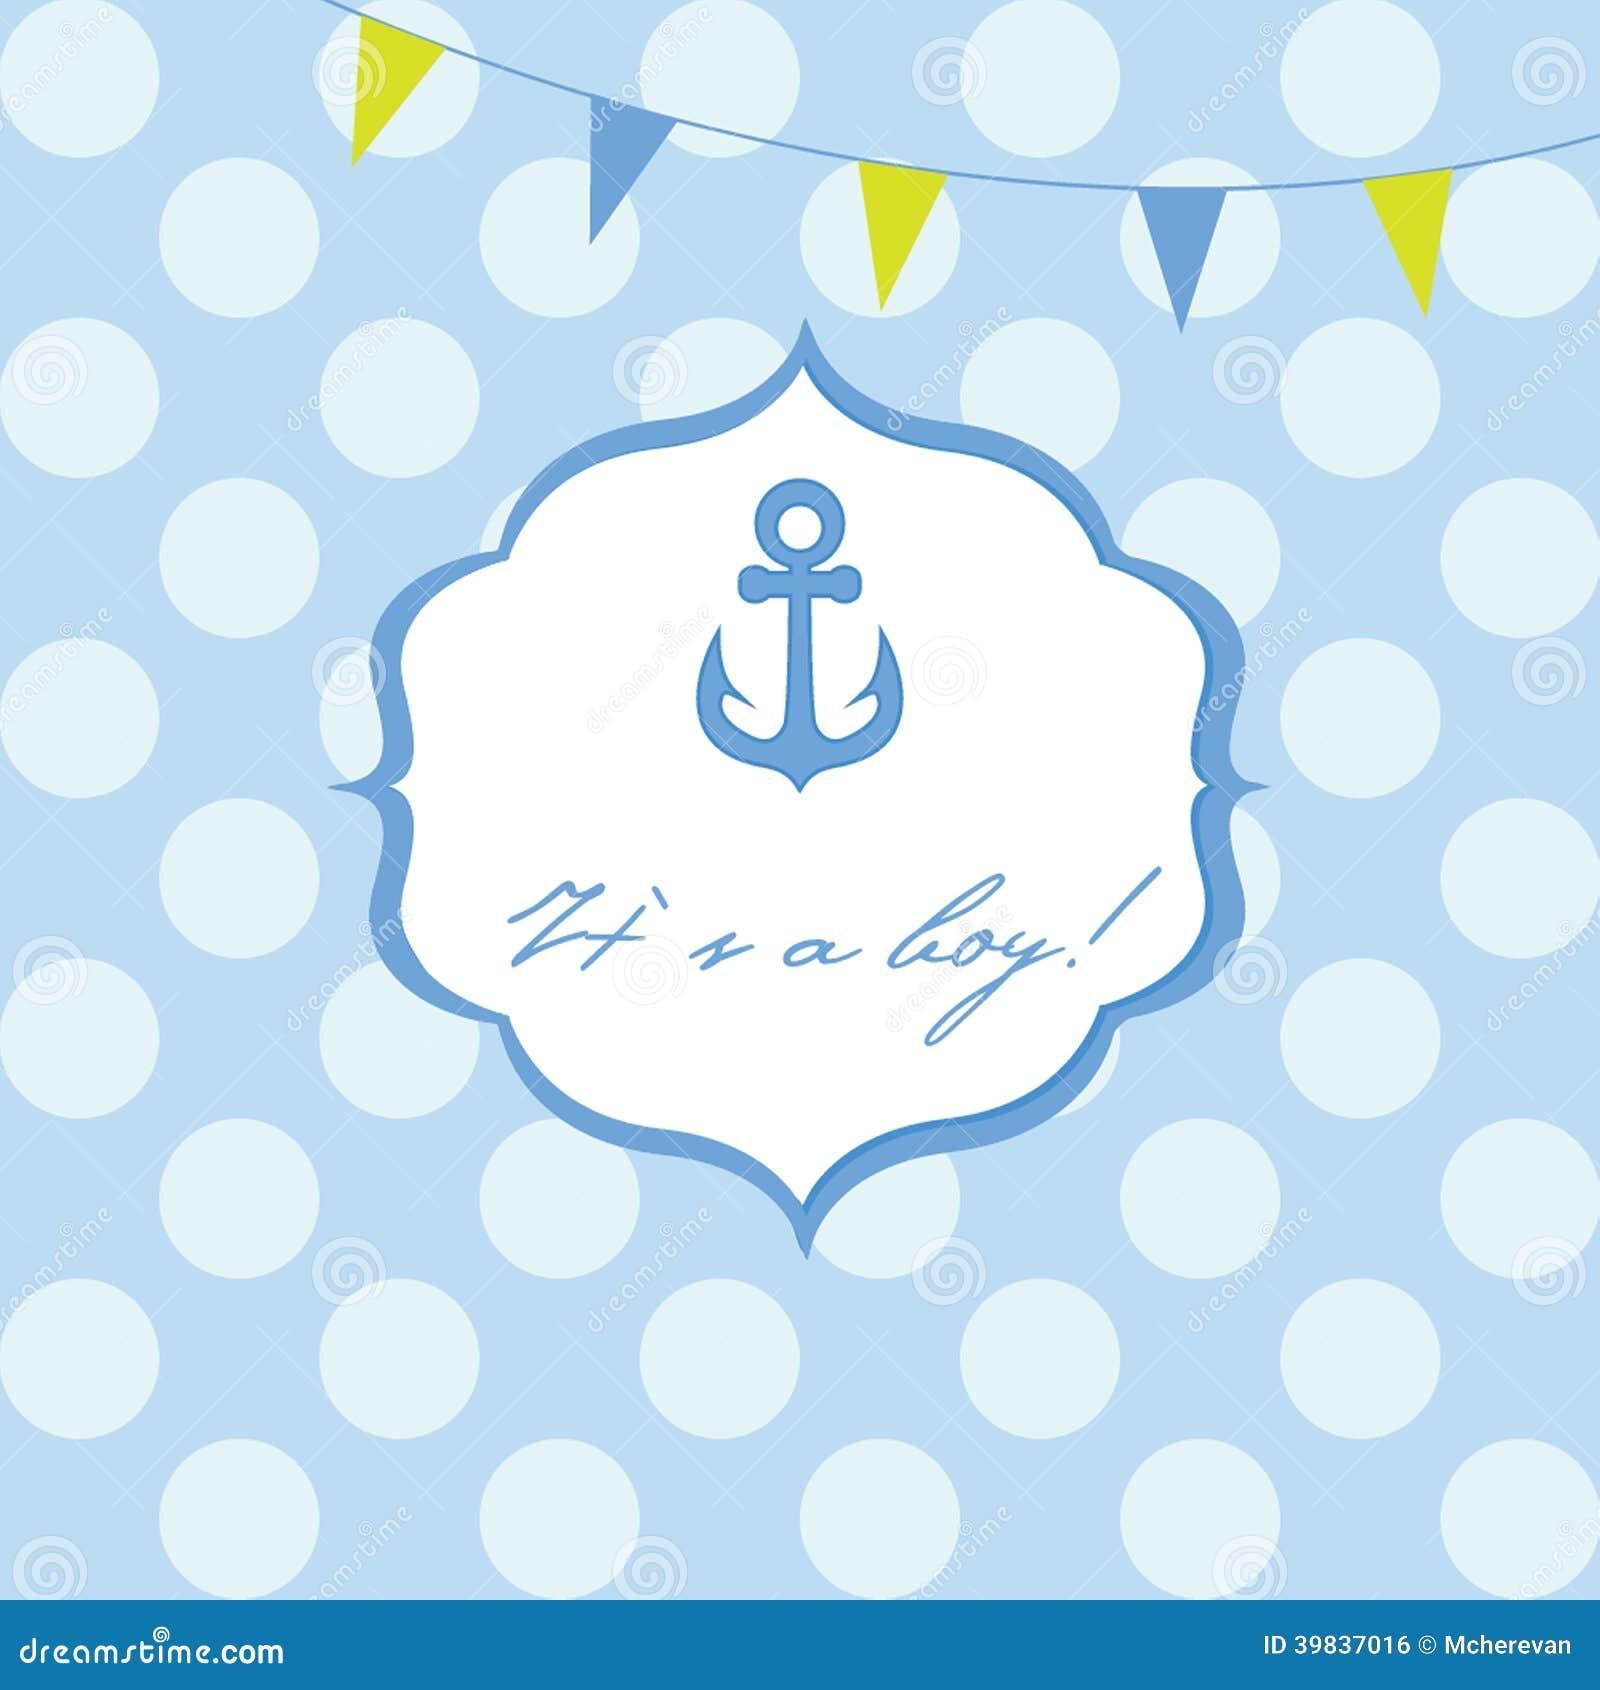 Pirate Baby Shower Invitation as nice invitations sample